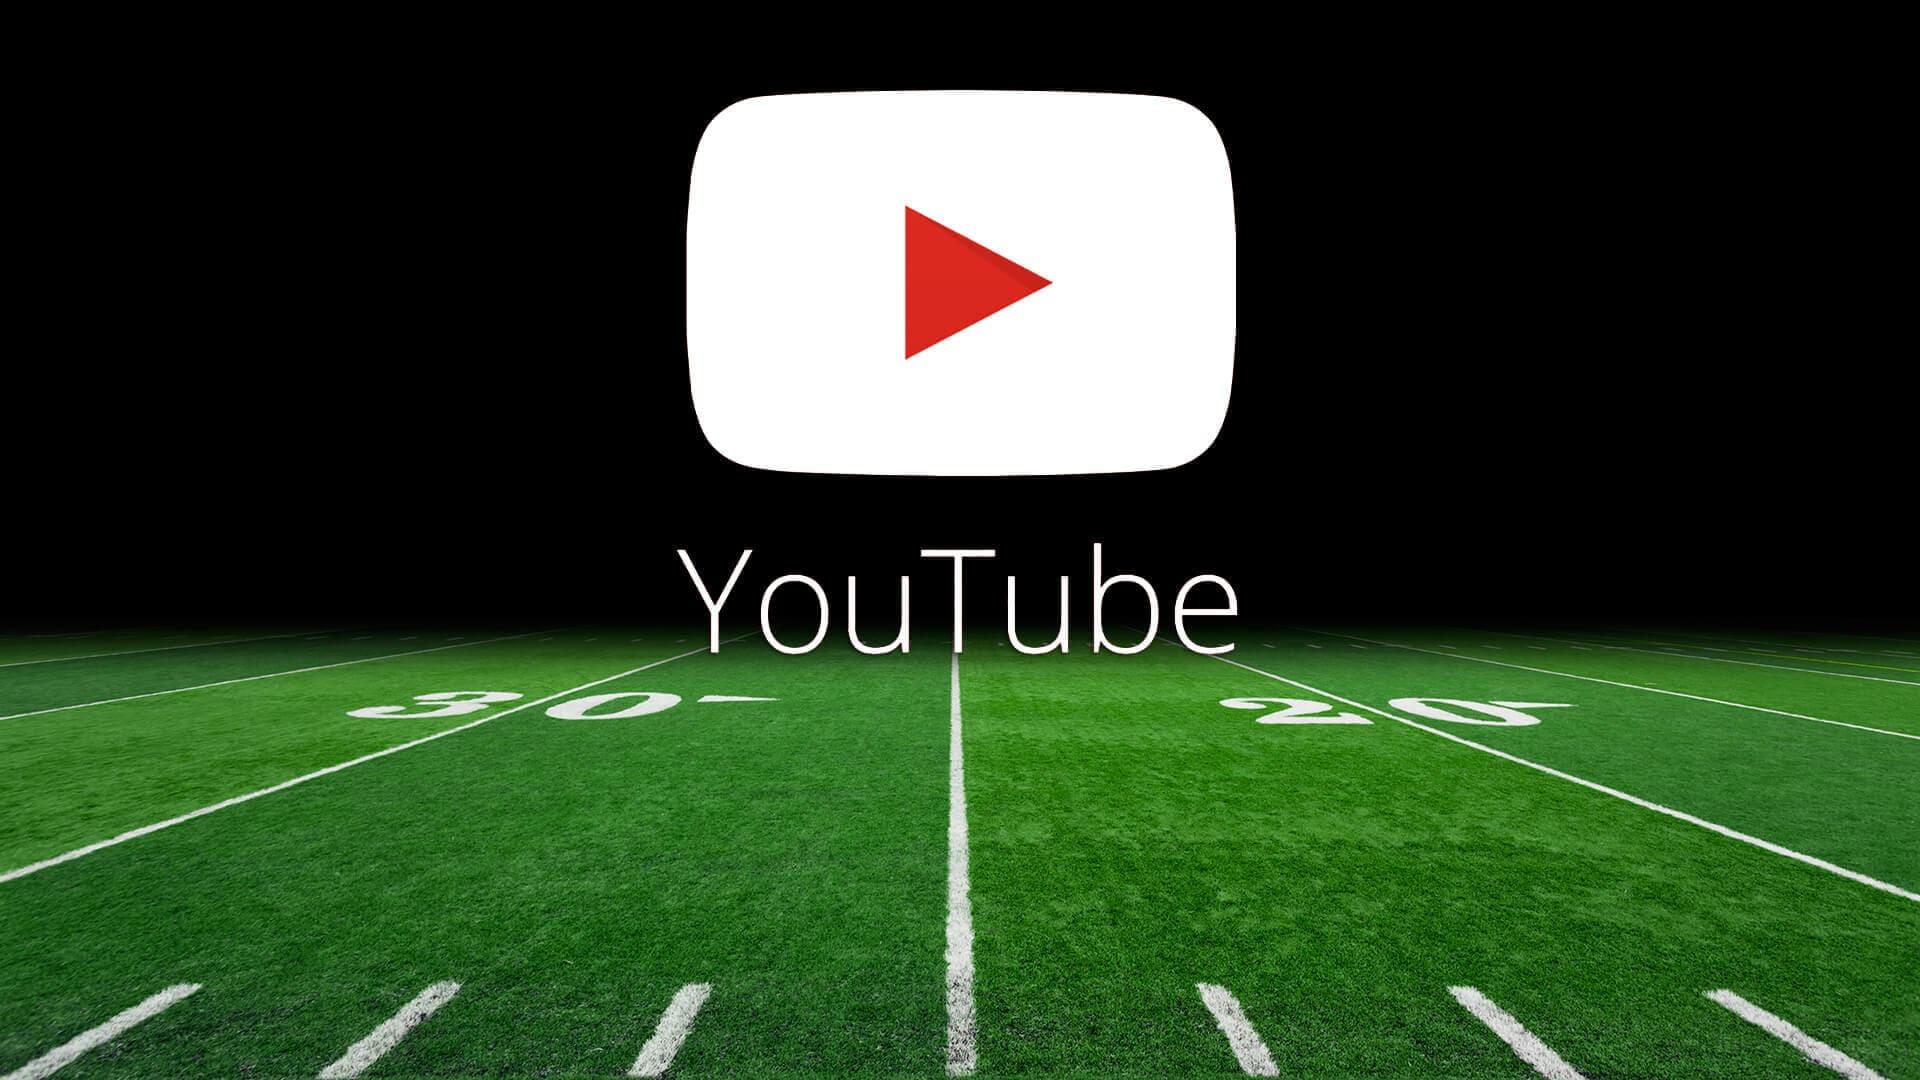 youtube-football